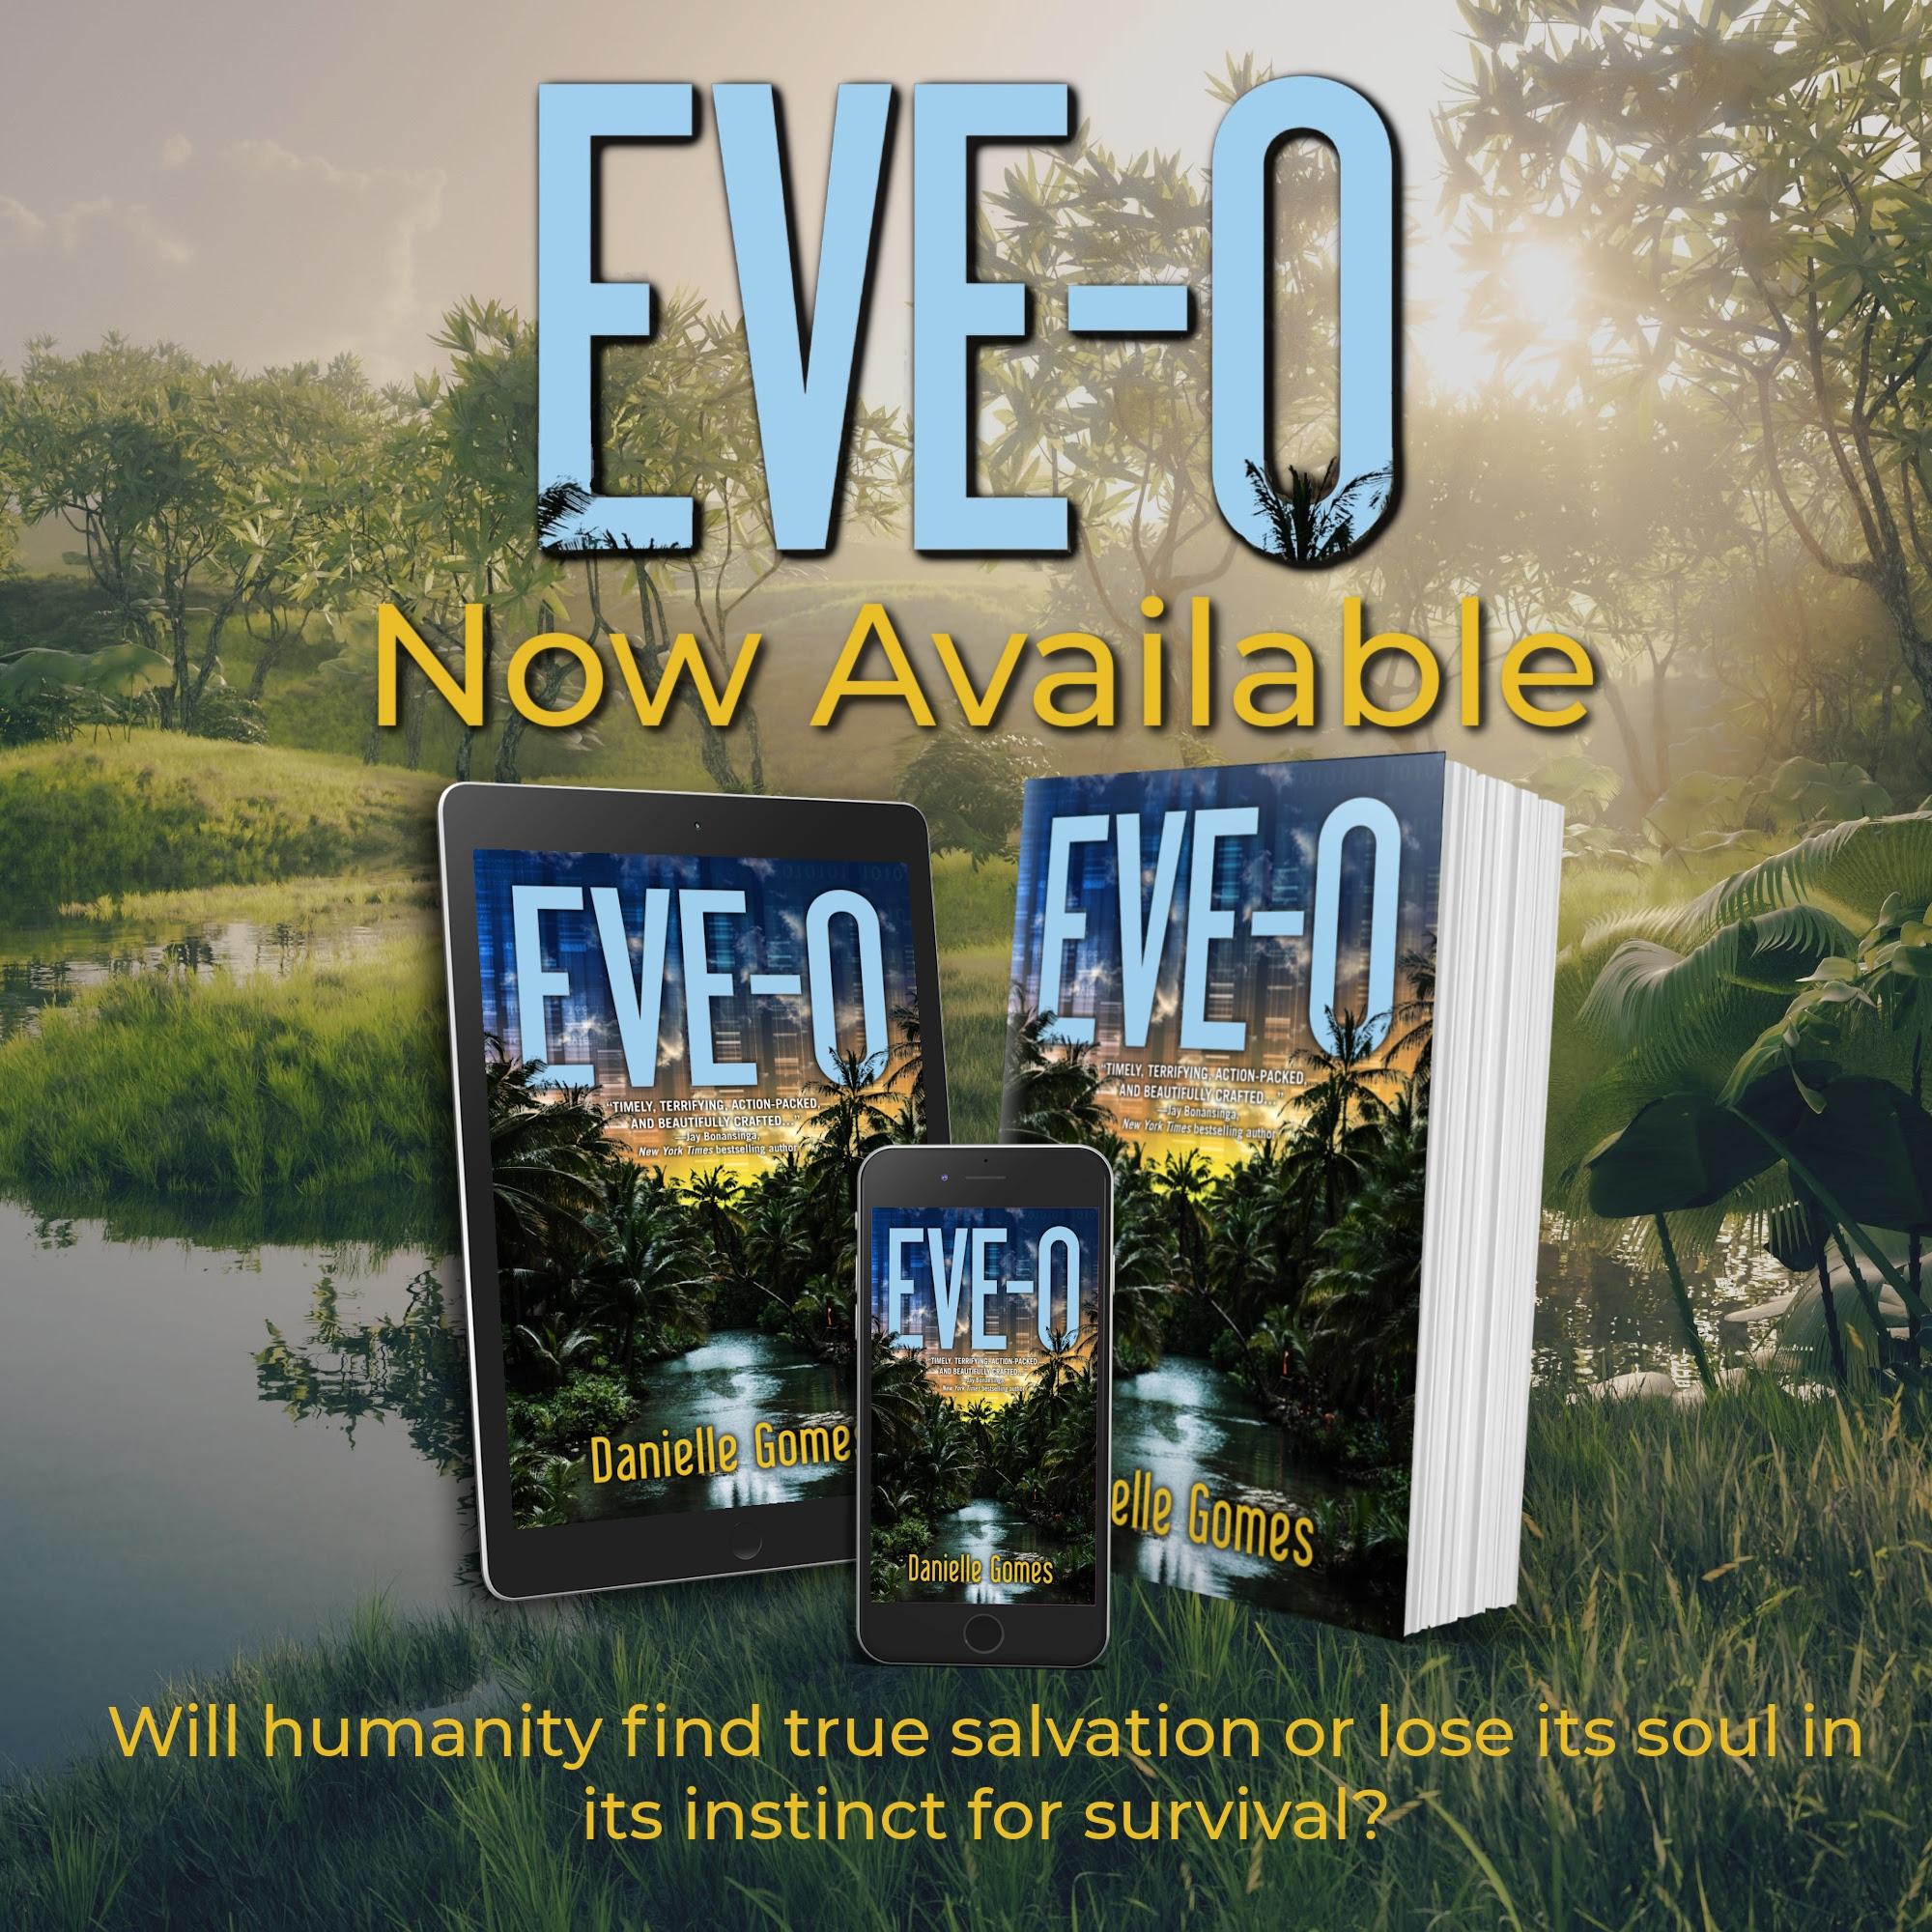 Eve-0 Tour Sq 2